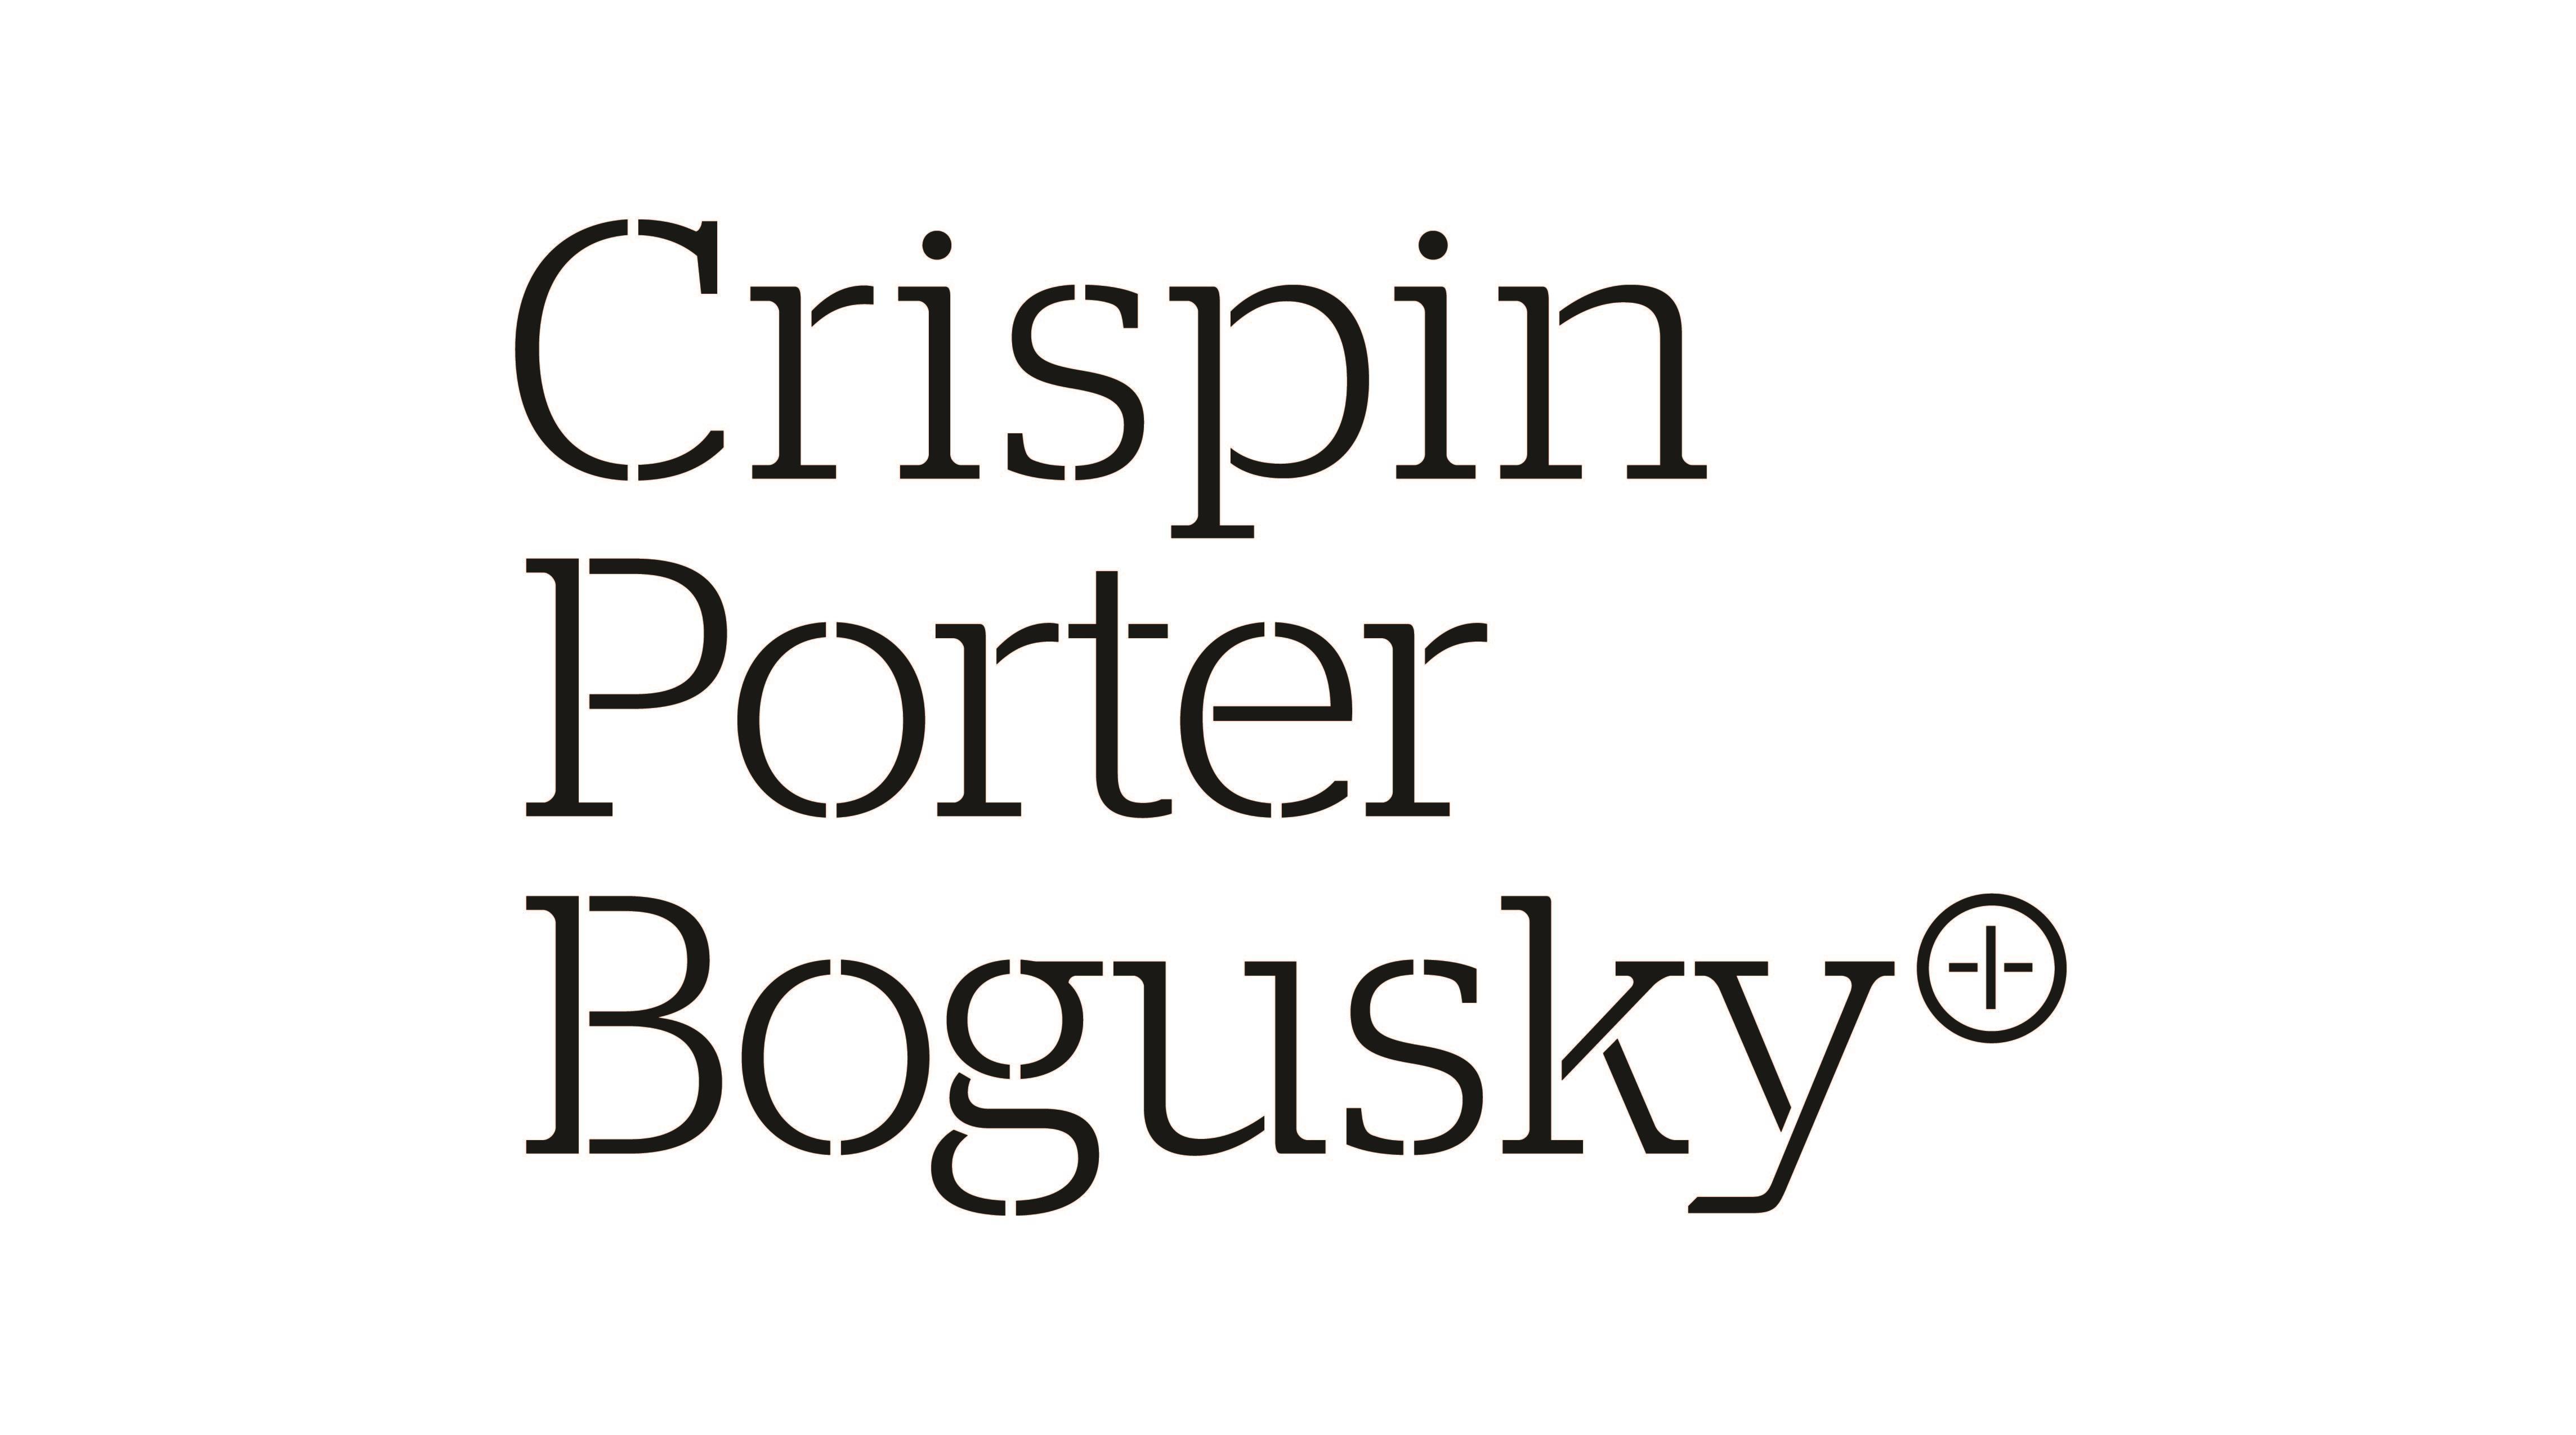 Crispin Porter Bogusky (CPB)